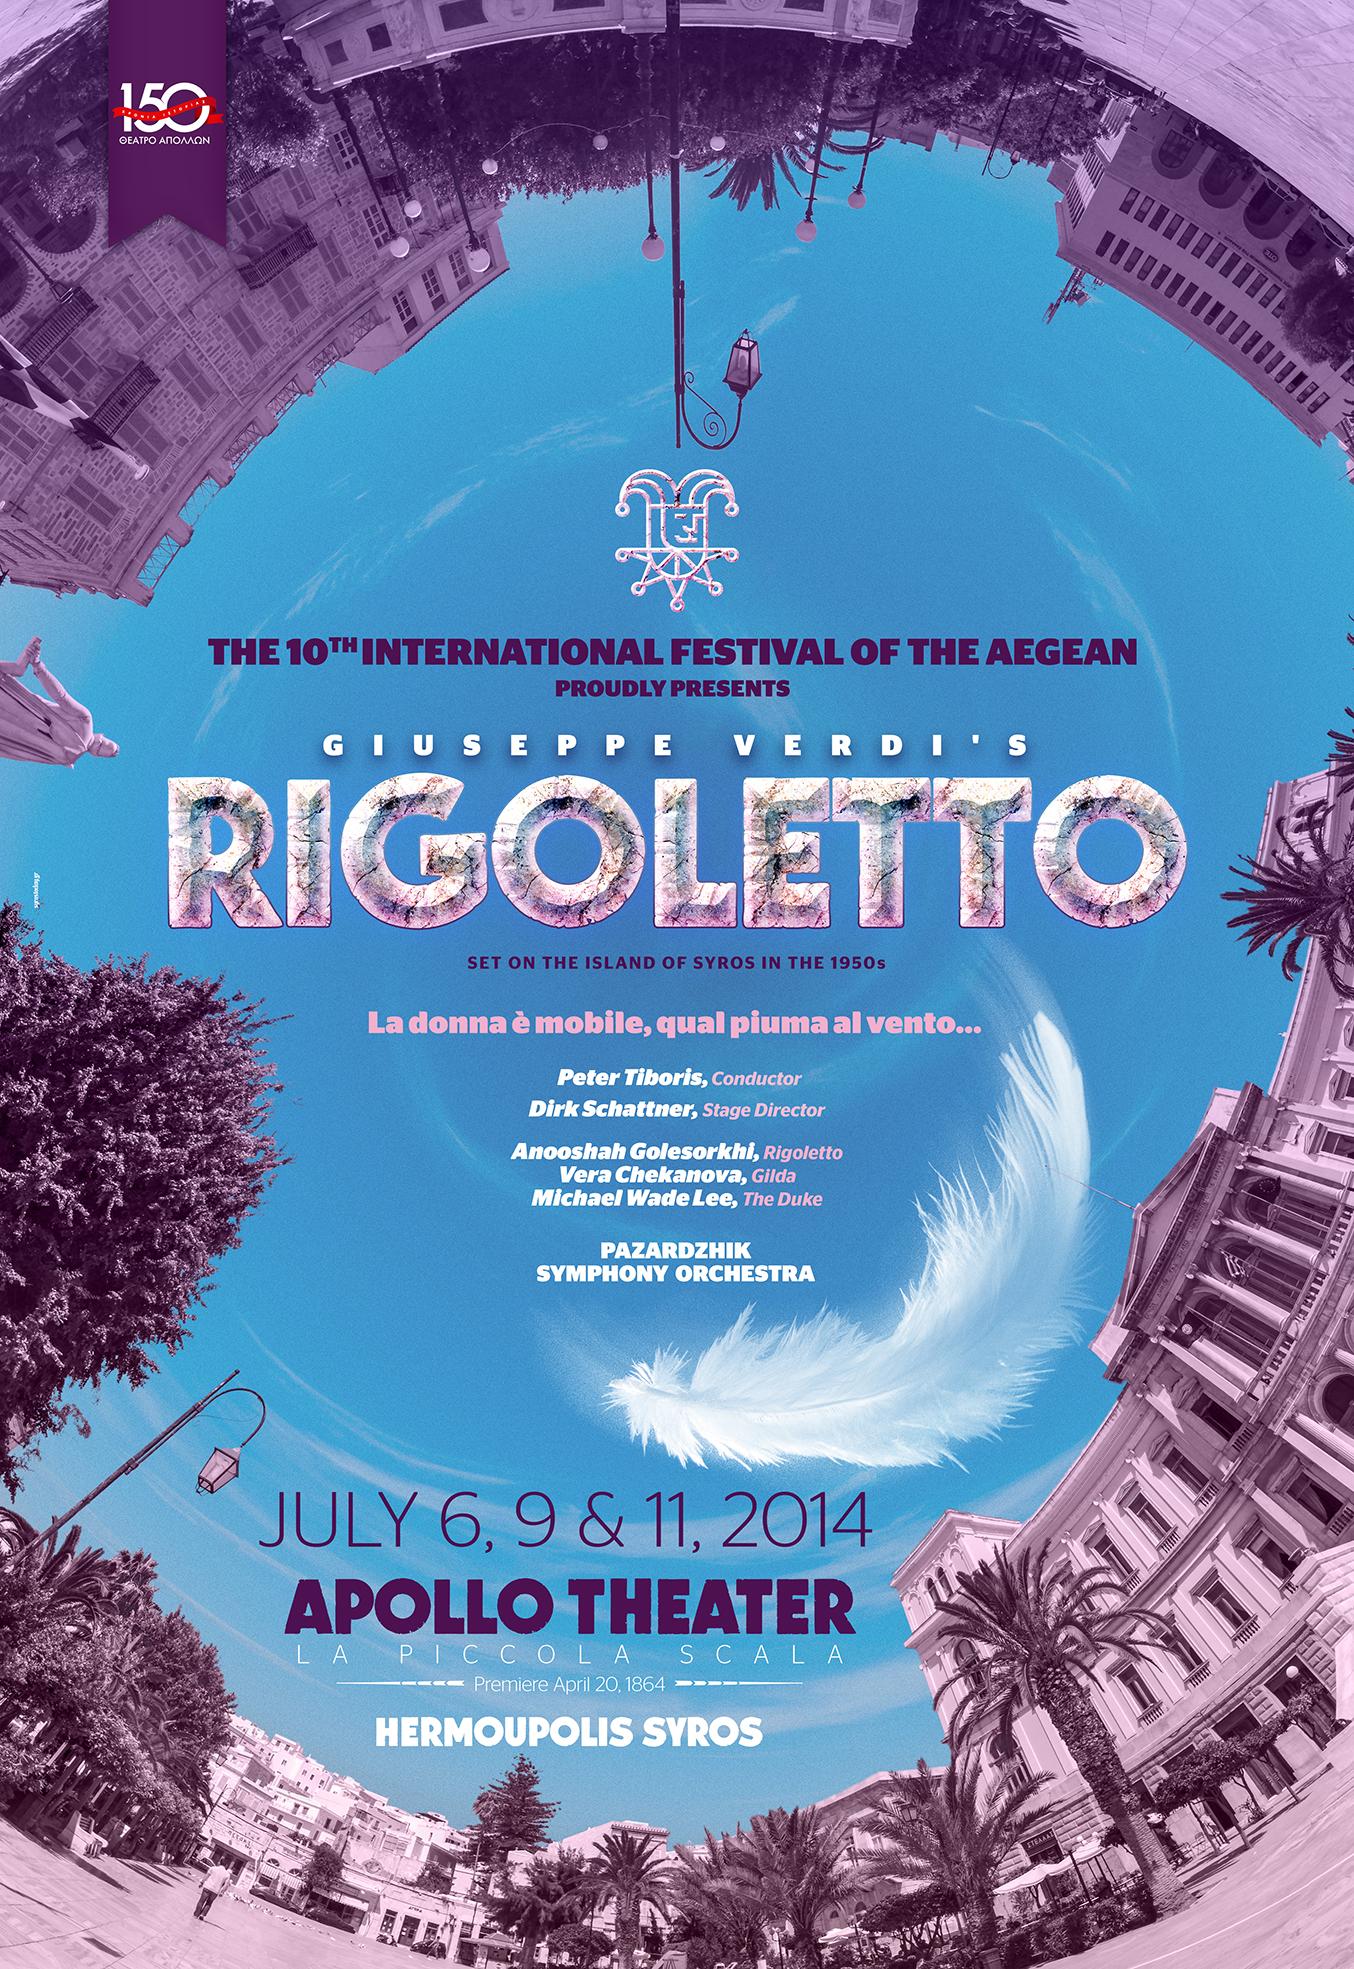 http://www.festivaloftheaegean.com/pdf/Rigoletto_Special_Final.jpg